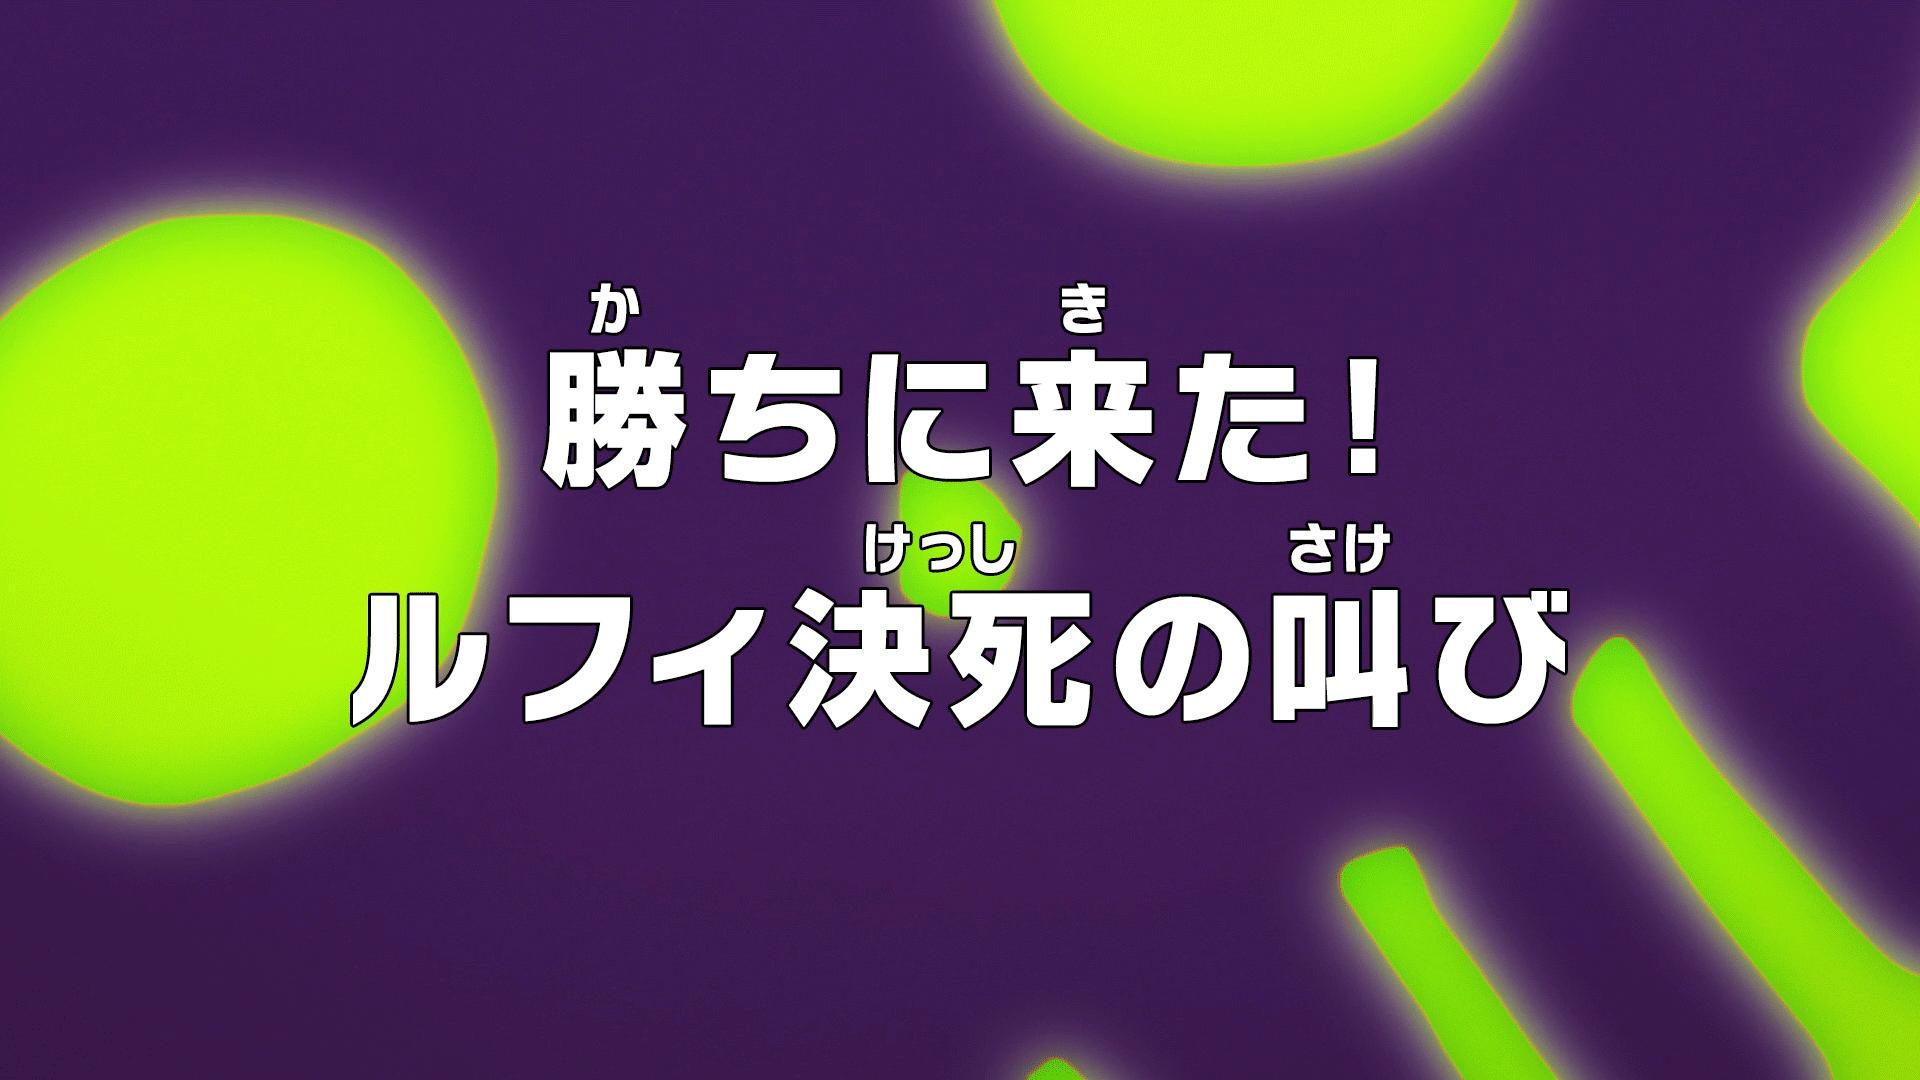 Episode 949